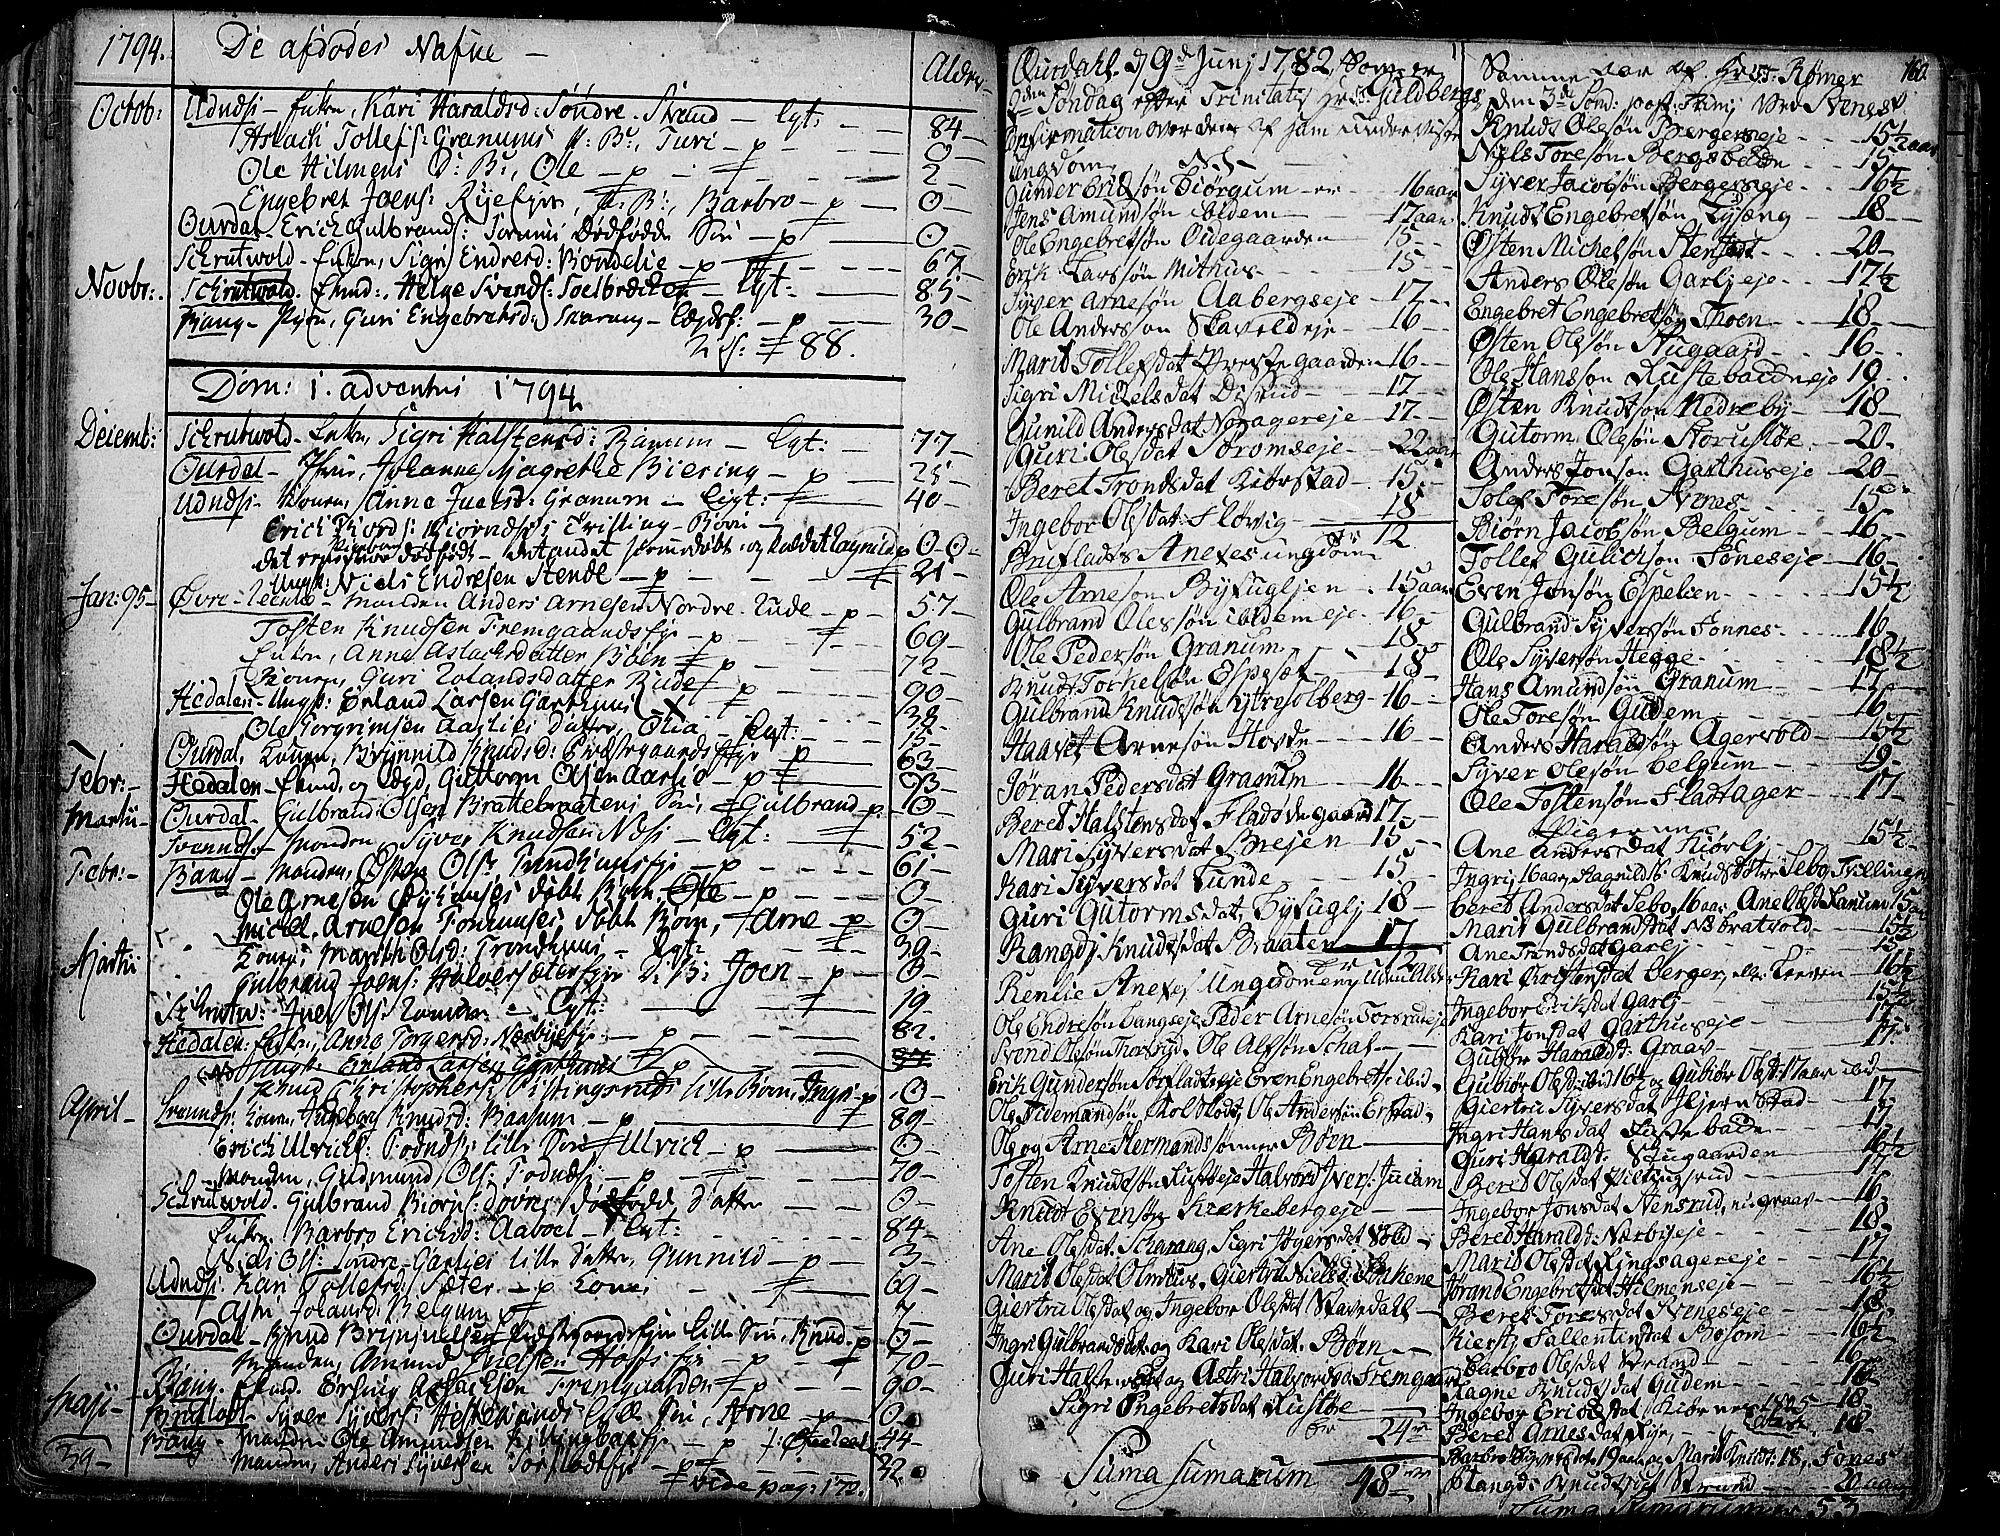 SAH, Aurdal prestekontor, Ministerialbok nr. 6, 1781-1804, s. 160